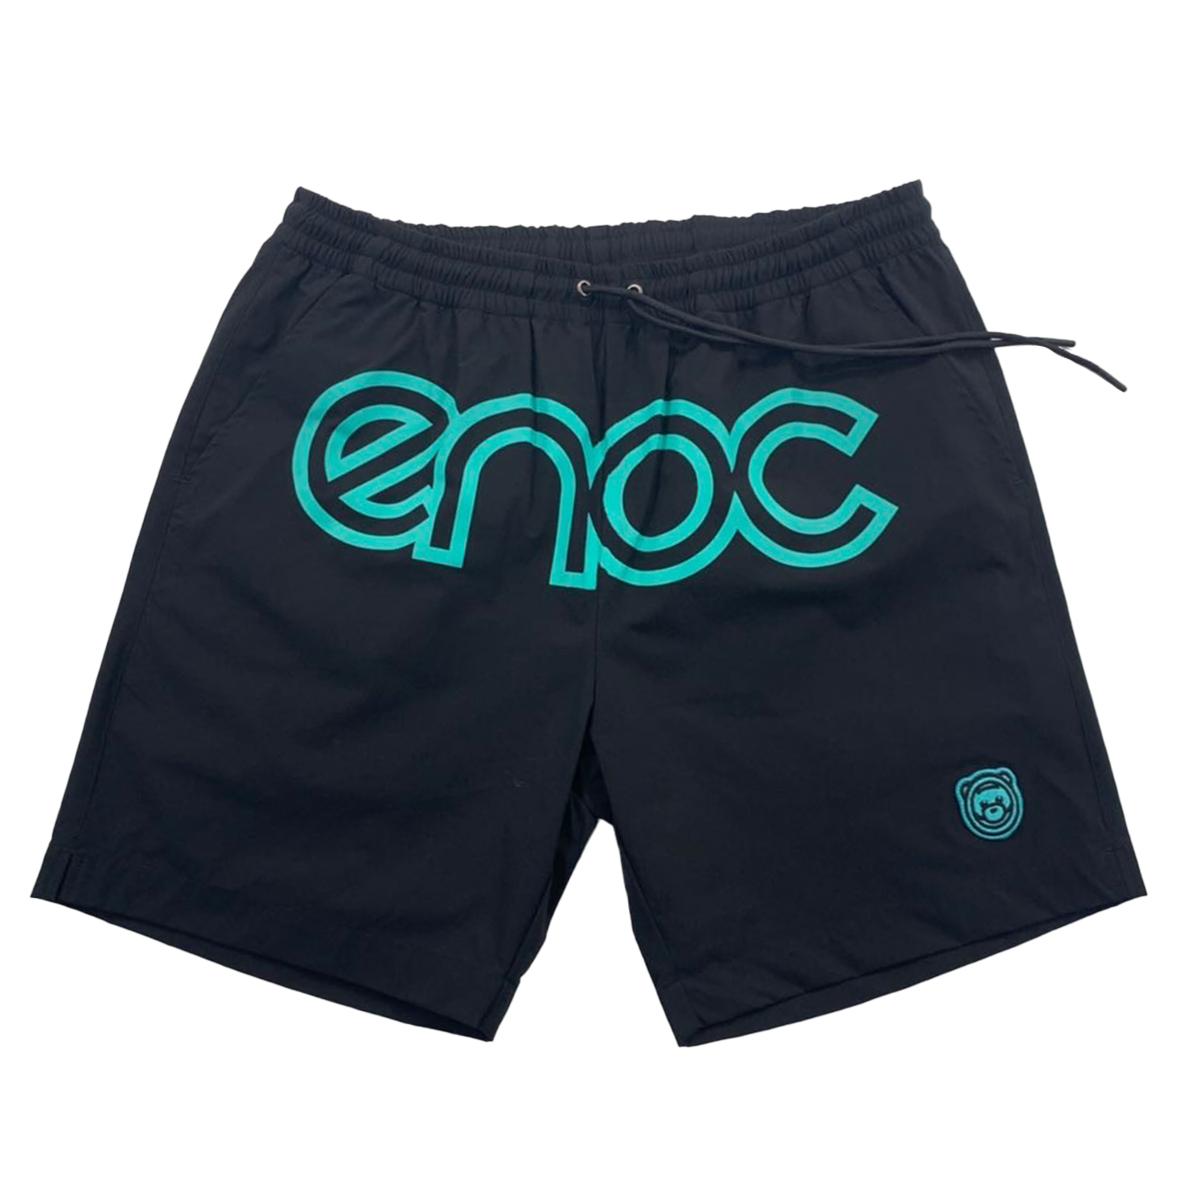 ENOC Black Shorts